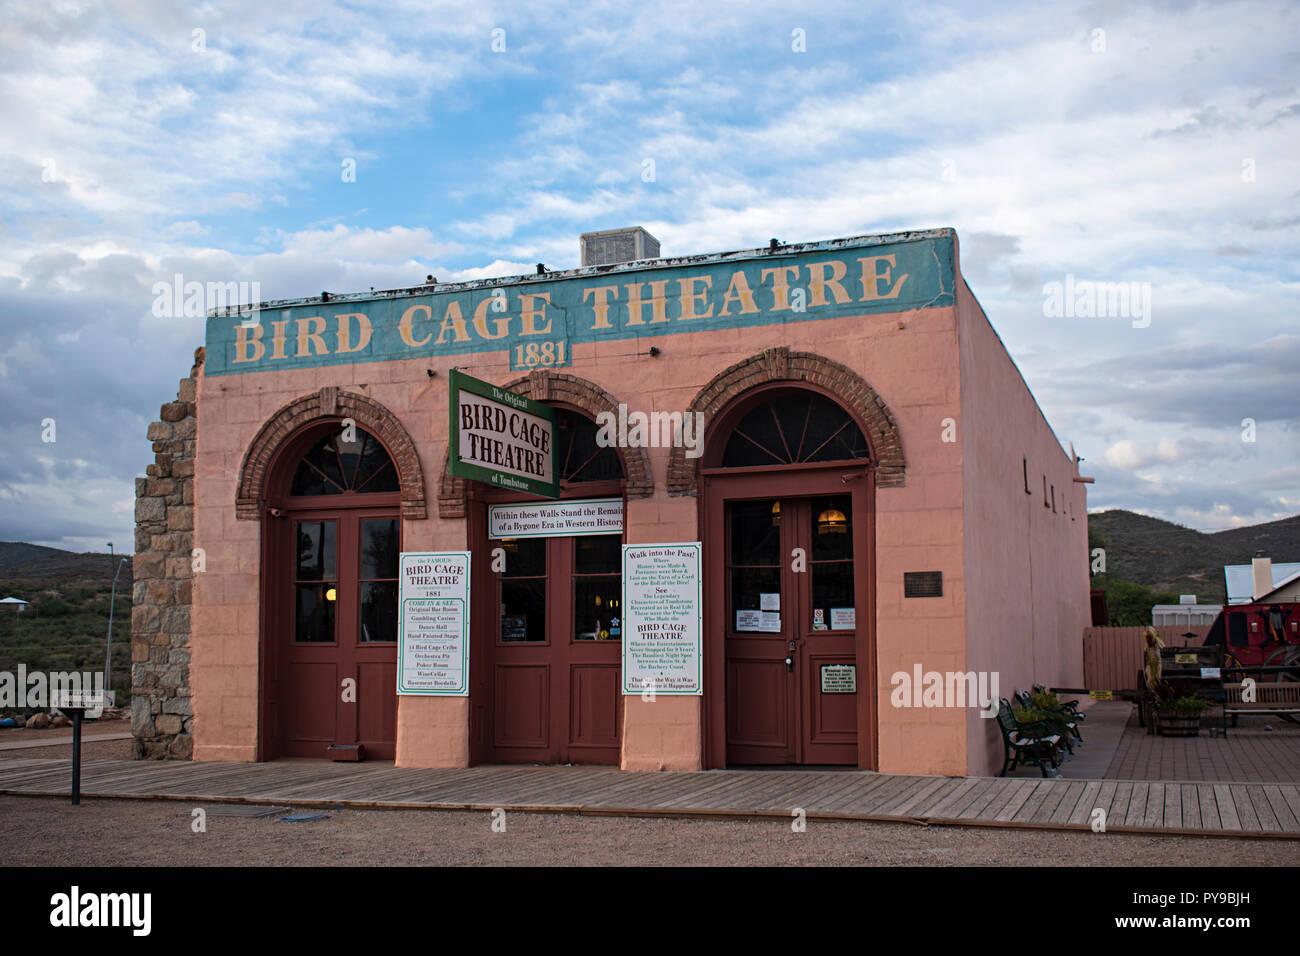 Bird Cage Theatre. Tombstone Arizona, EE.UU. Foto de stock